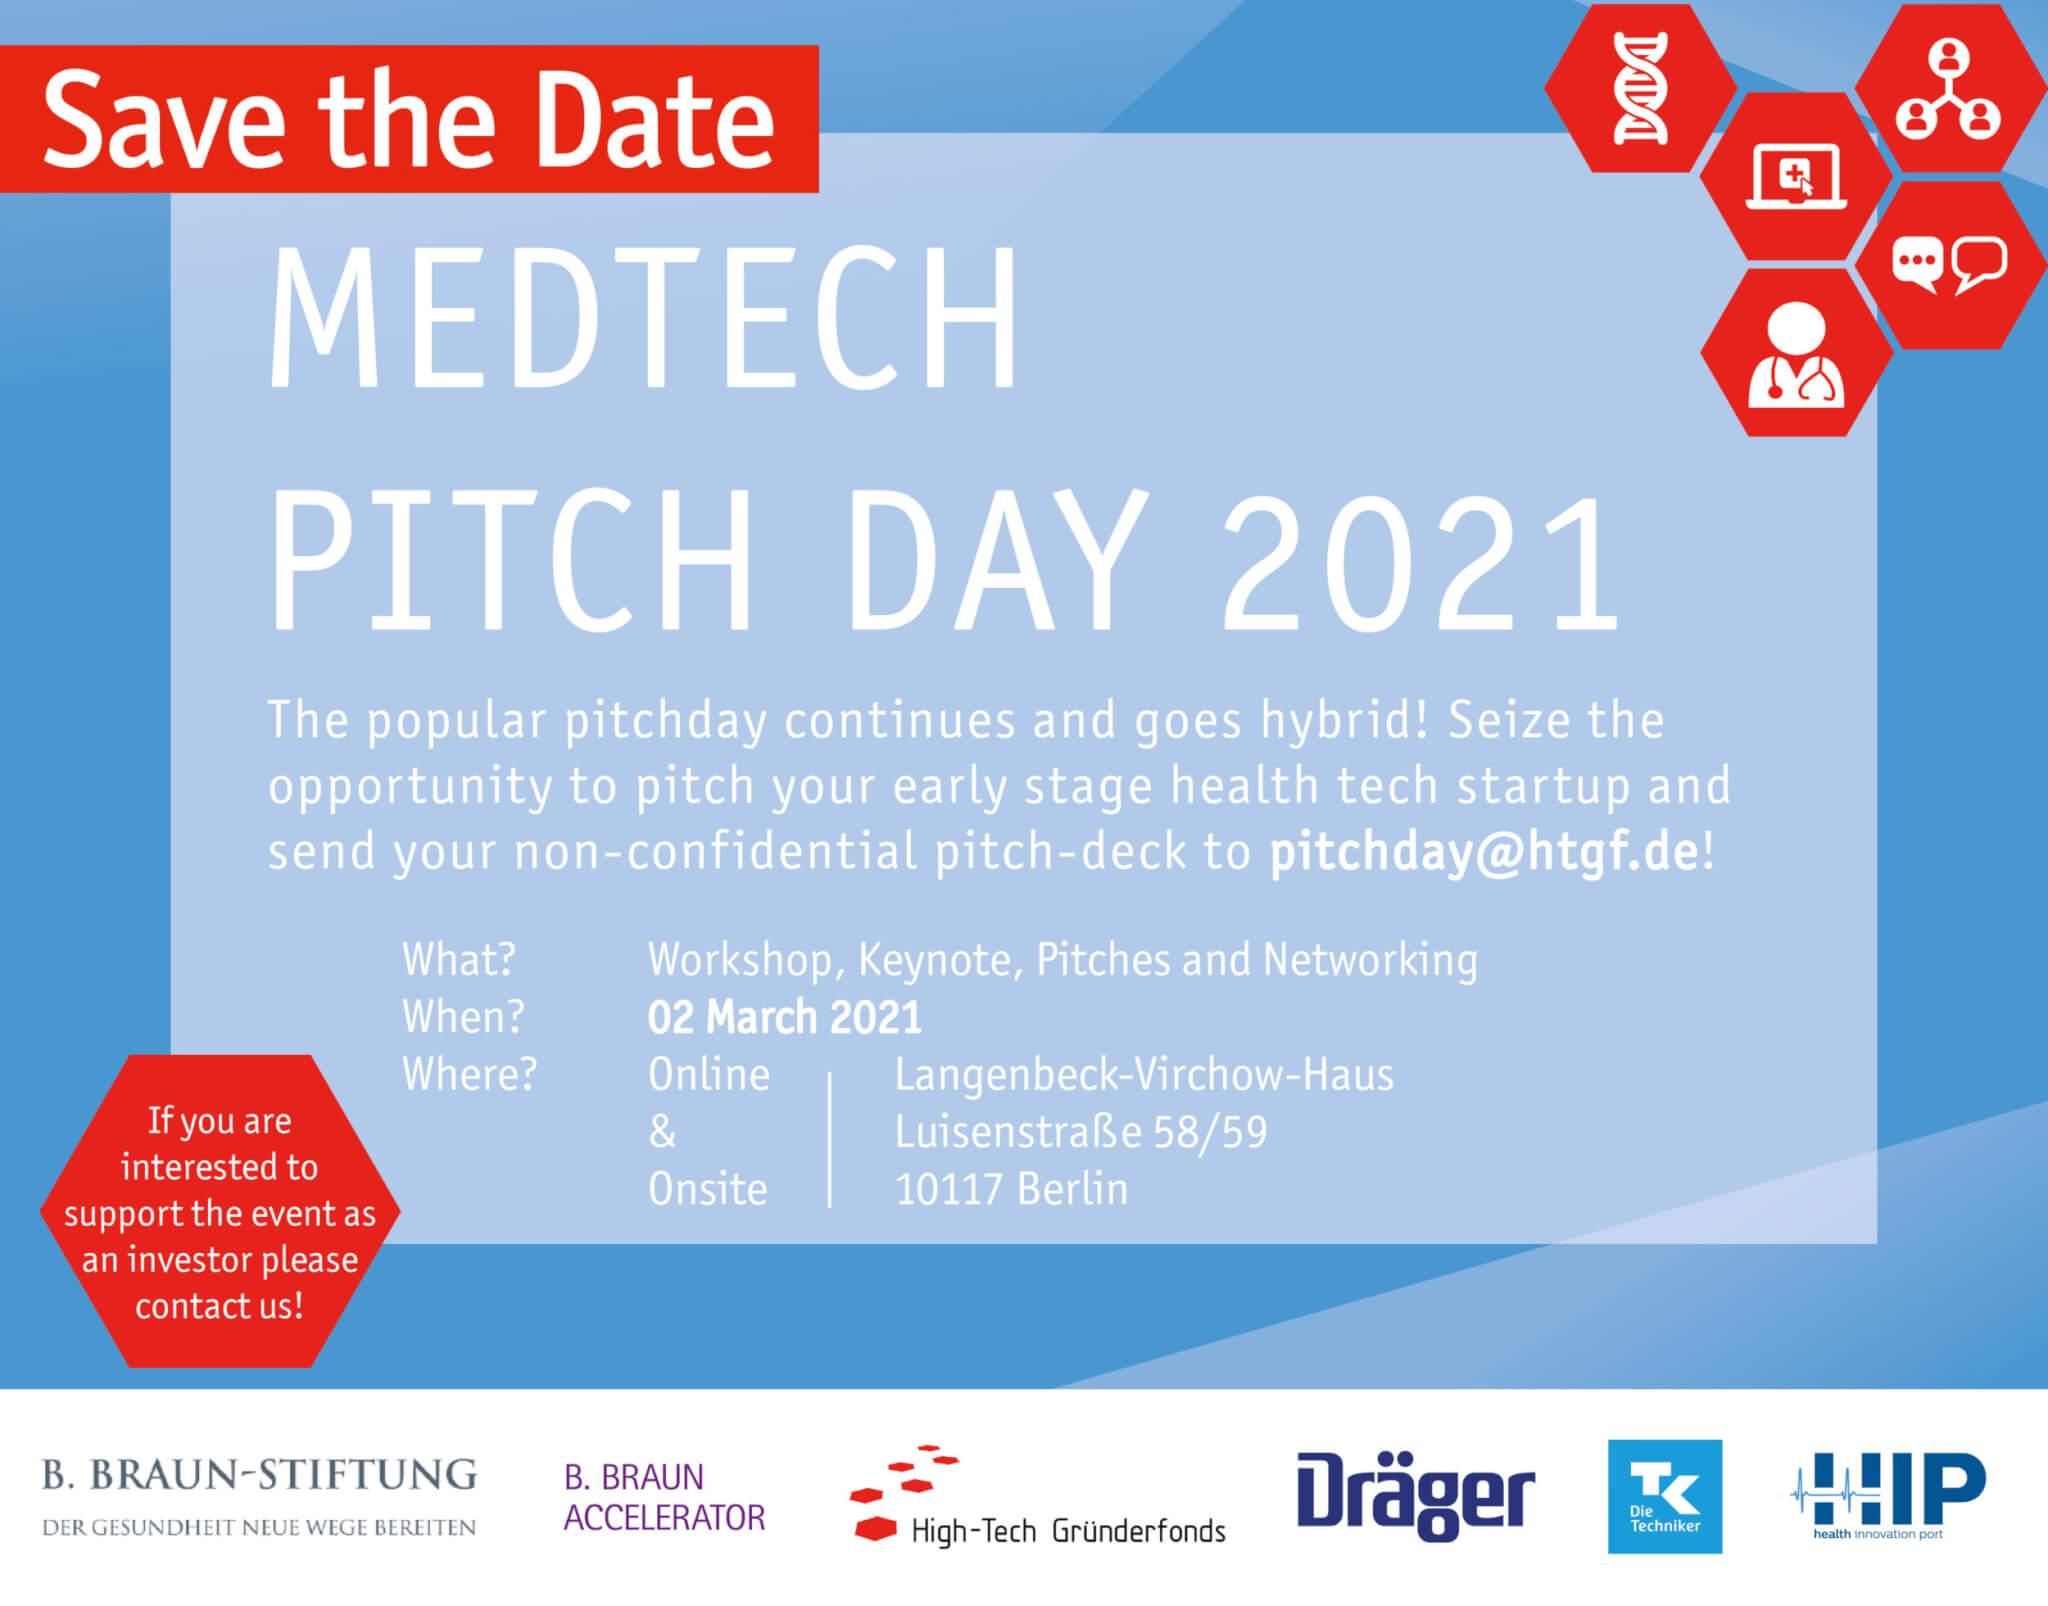 HTGF MedTech Pitch Day 2020